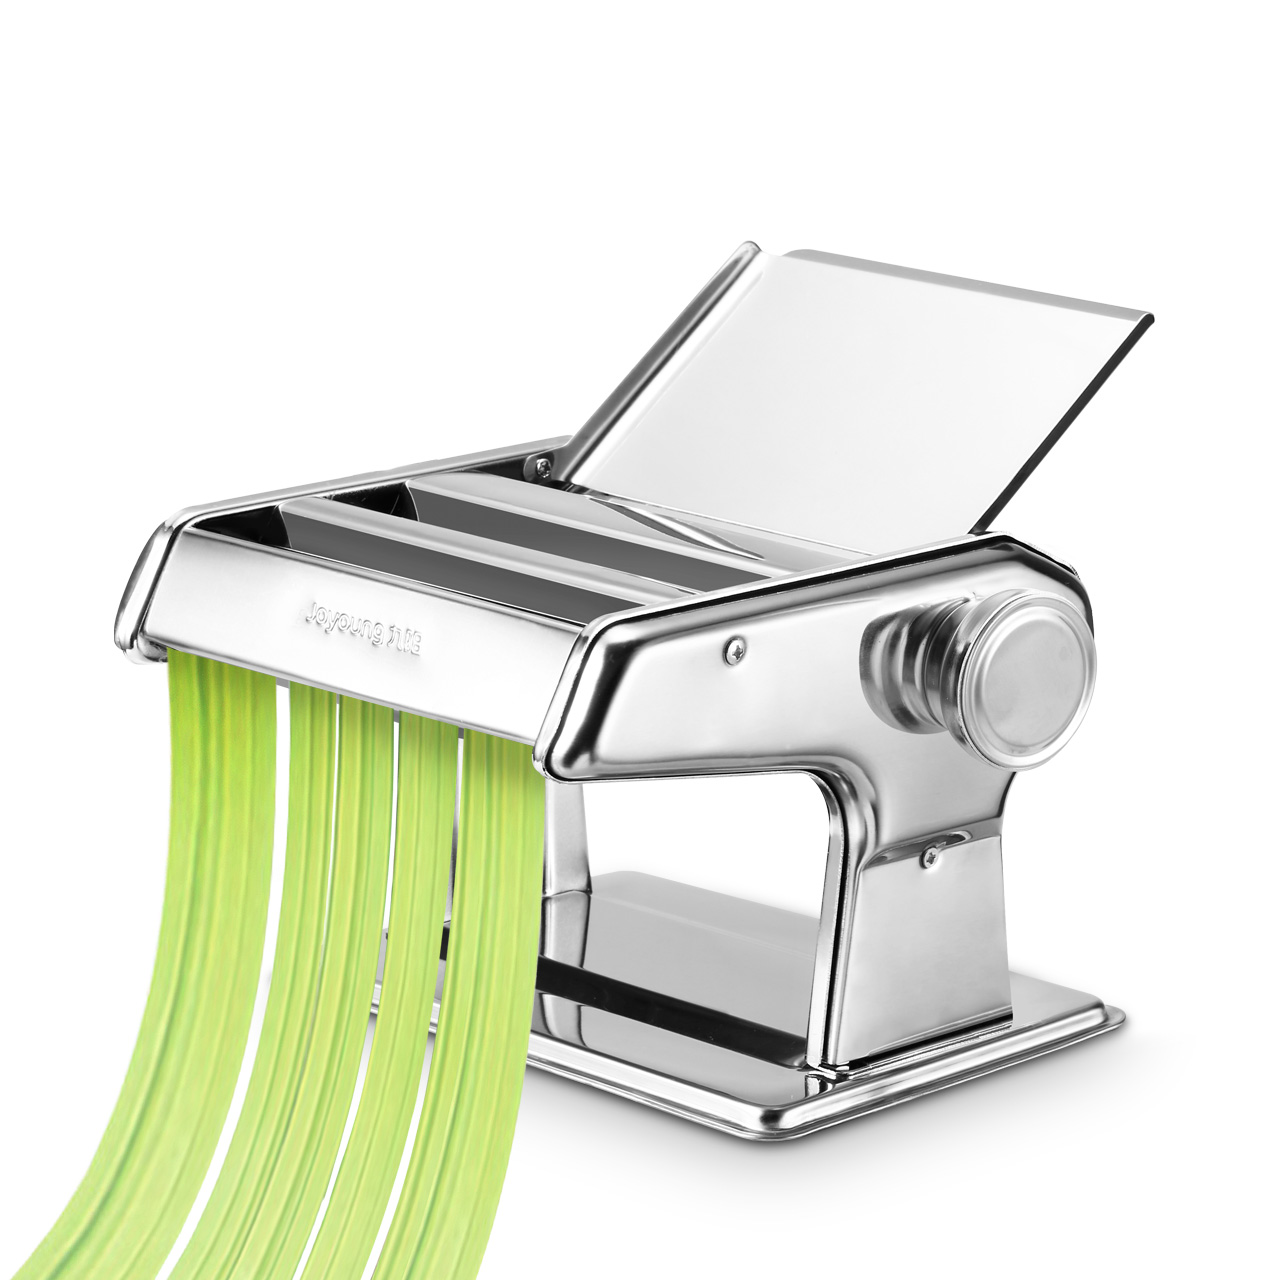 Jo Noodles Maker Machine Ajustable Thickness Handheld Stainless Steel Dough Pressing Machine Spaghetti Pasta Maker Brand